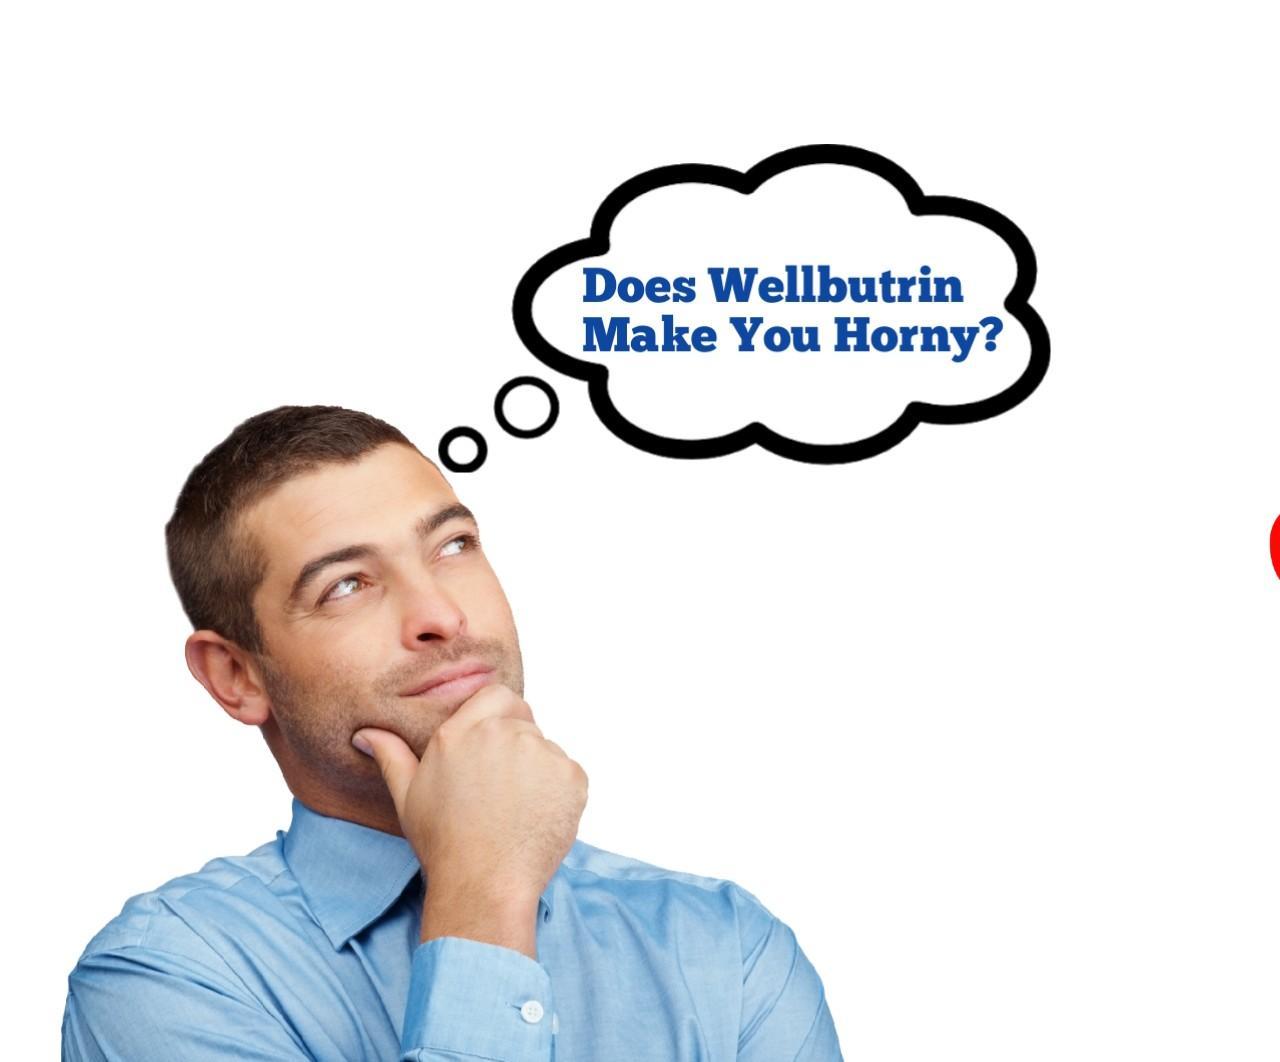 Does Wellbutrin Make You Hornier